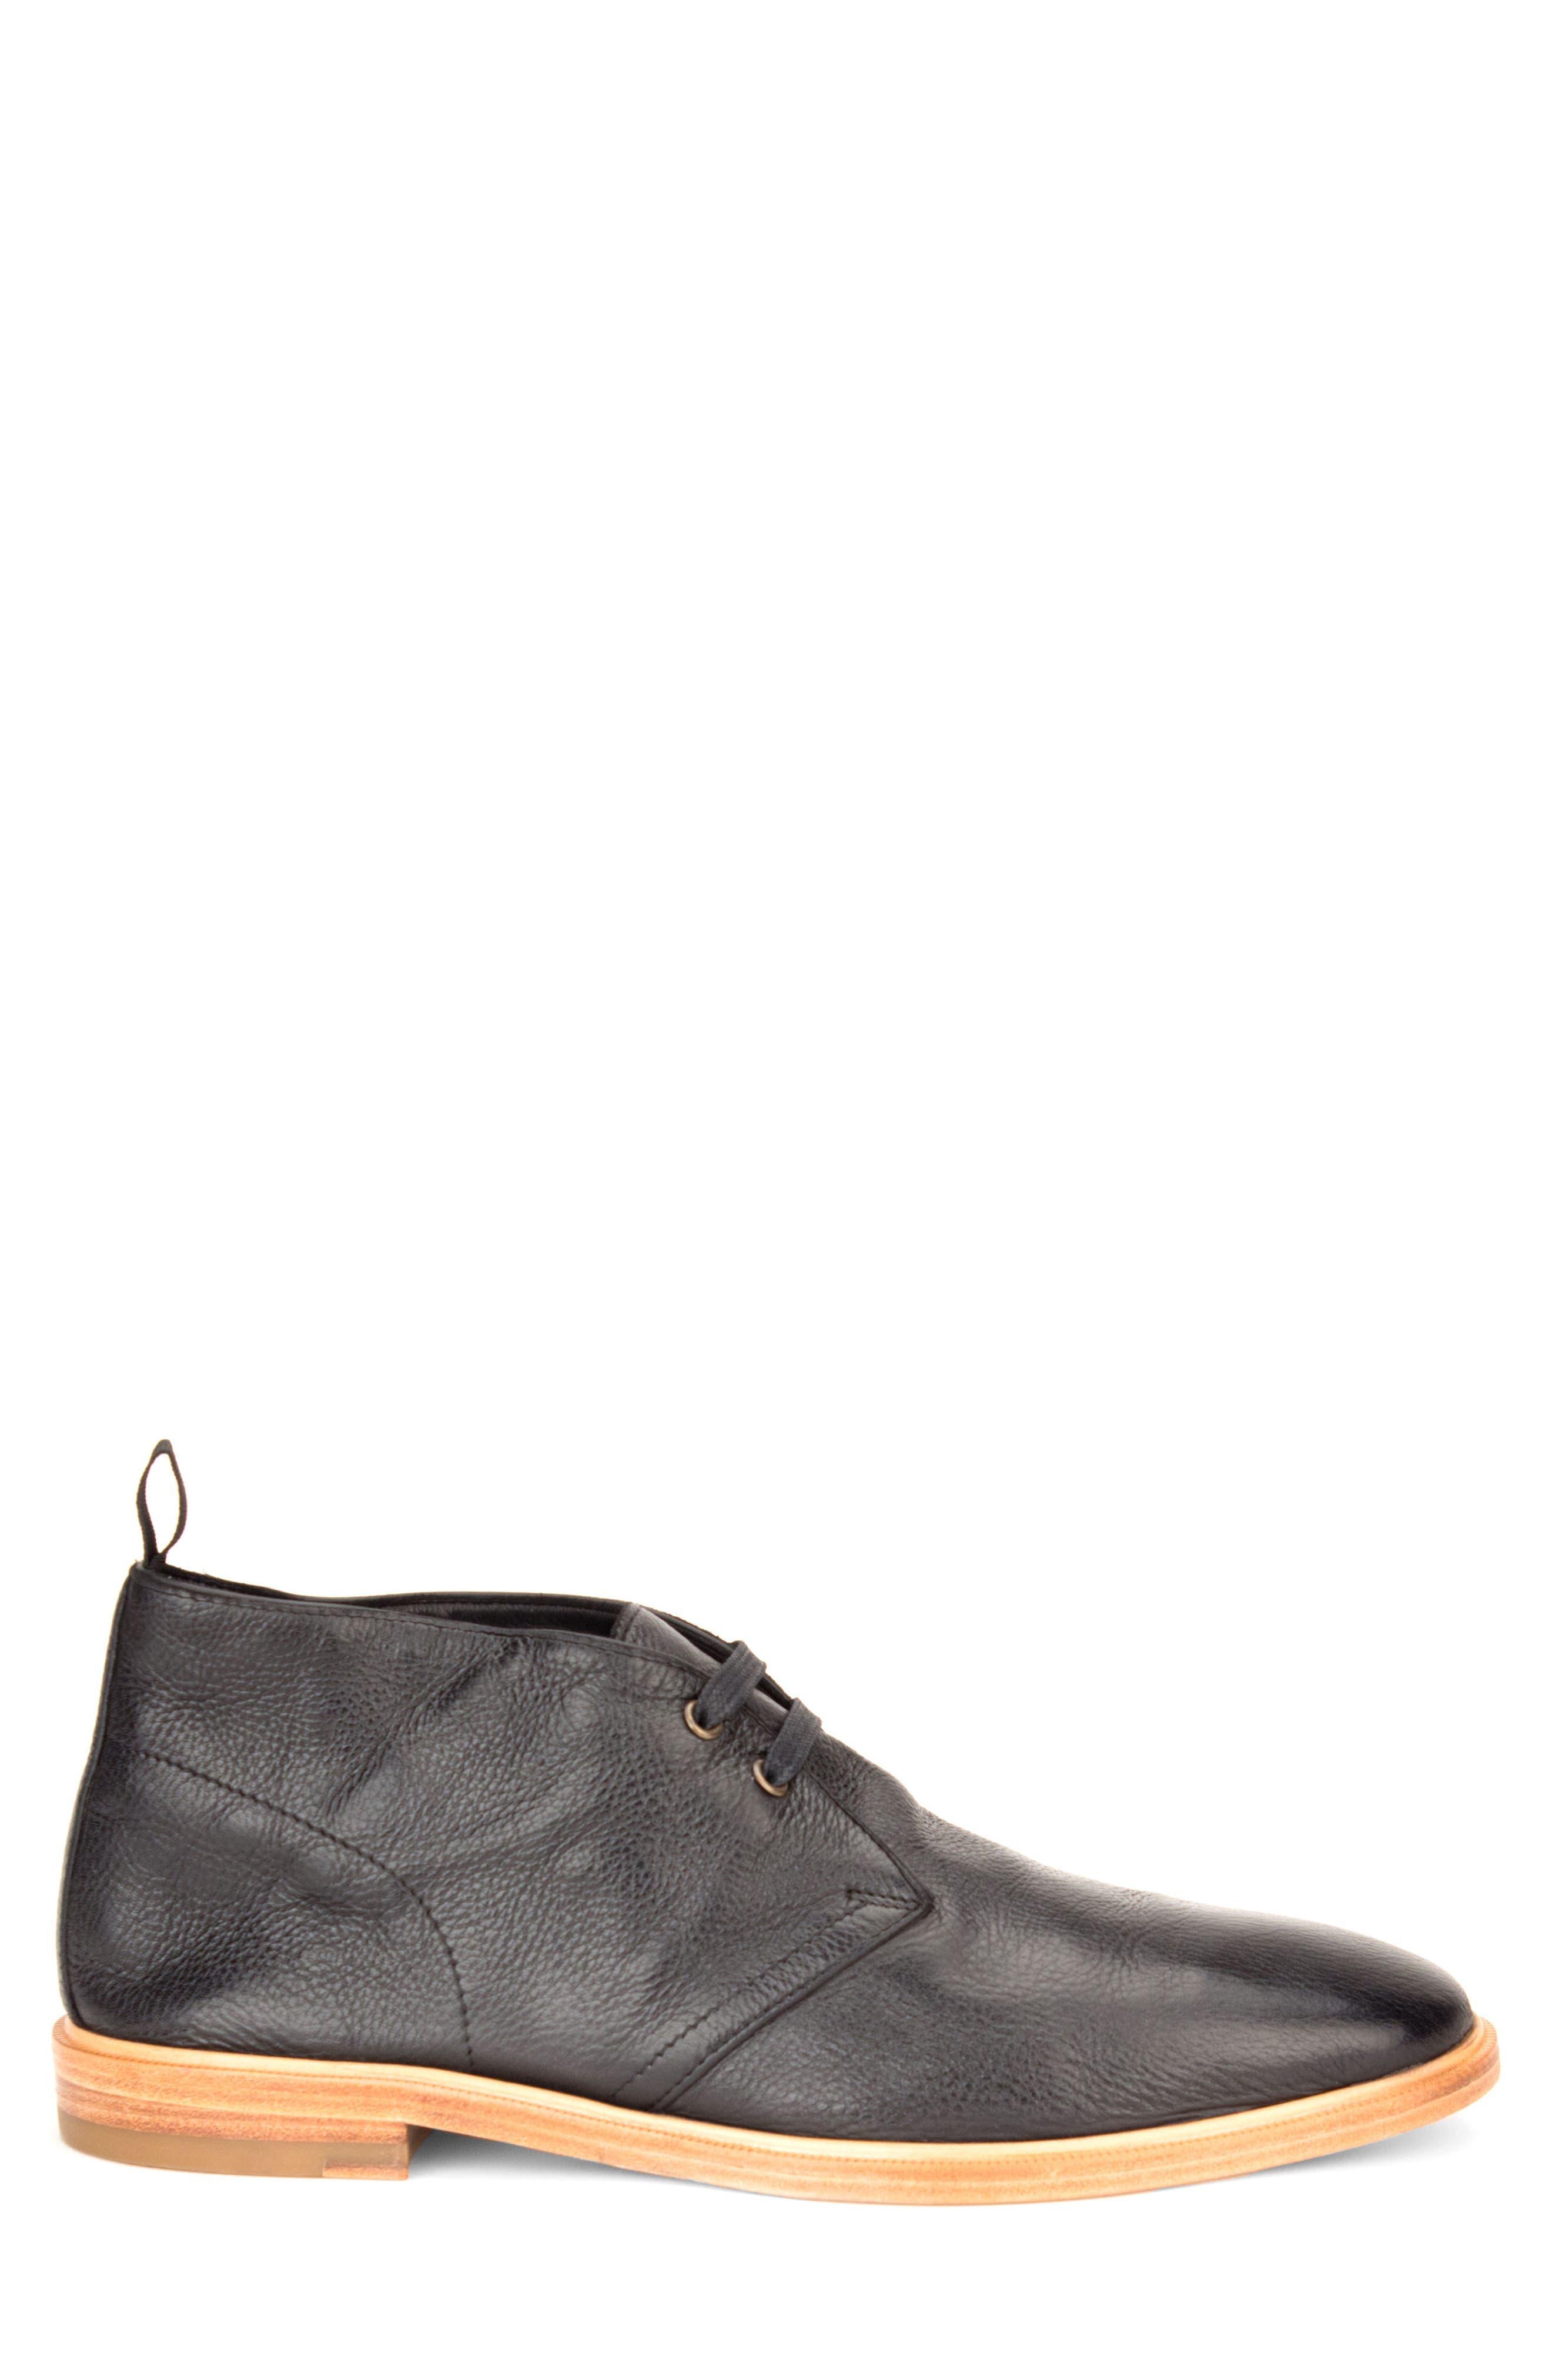 Luke Chukka Boot,                             Alternate thumbnail 3, color,                             Black Leather